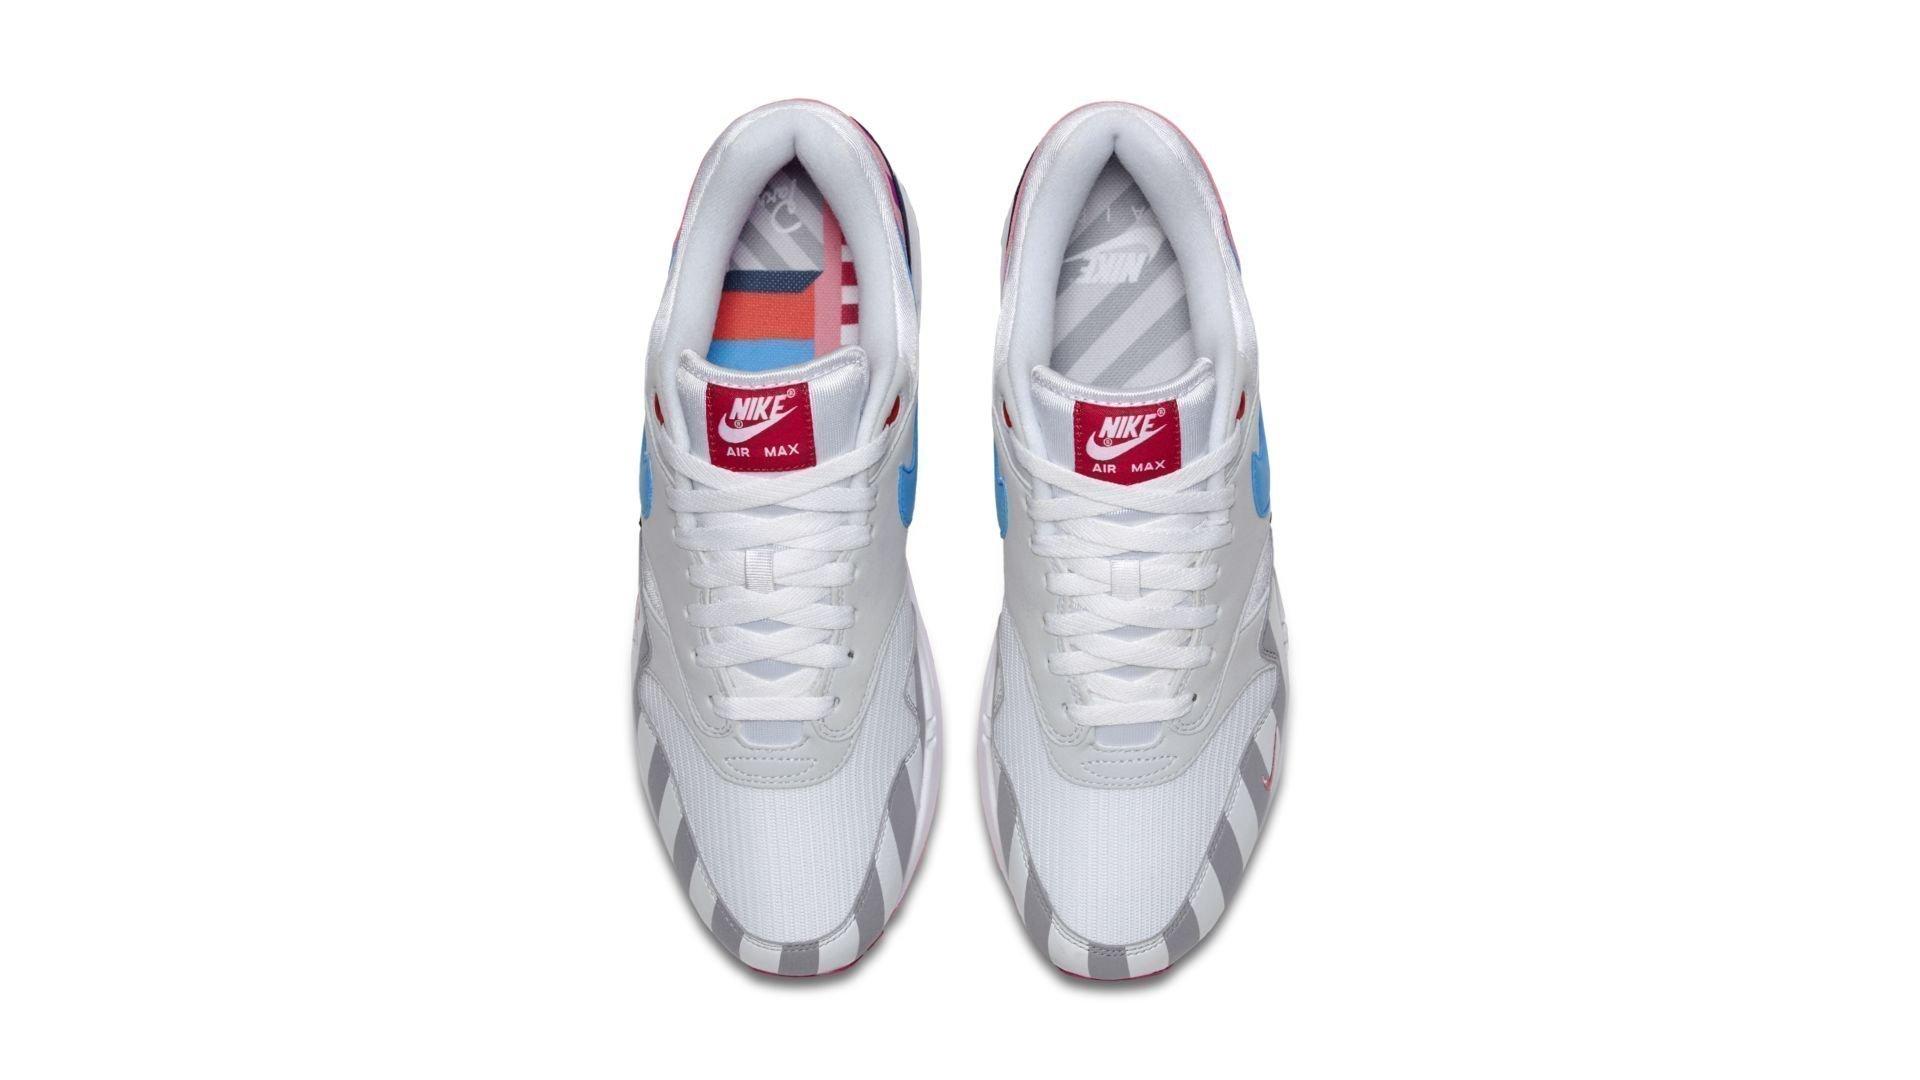 Nike Air Max 1 x Parra 'White/Multi color' (AT3057-100)